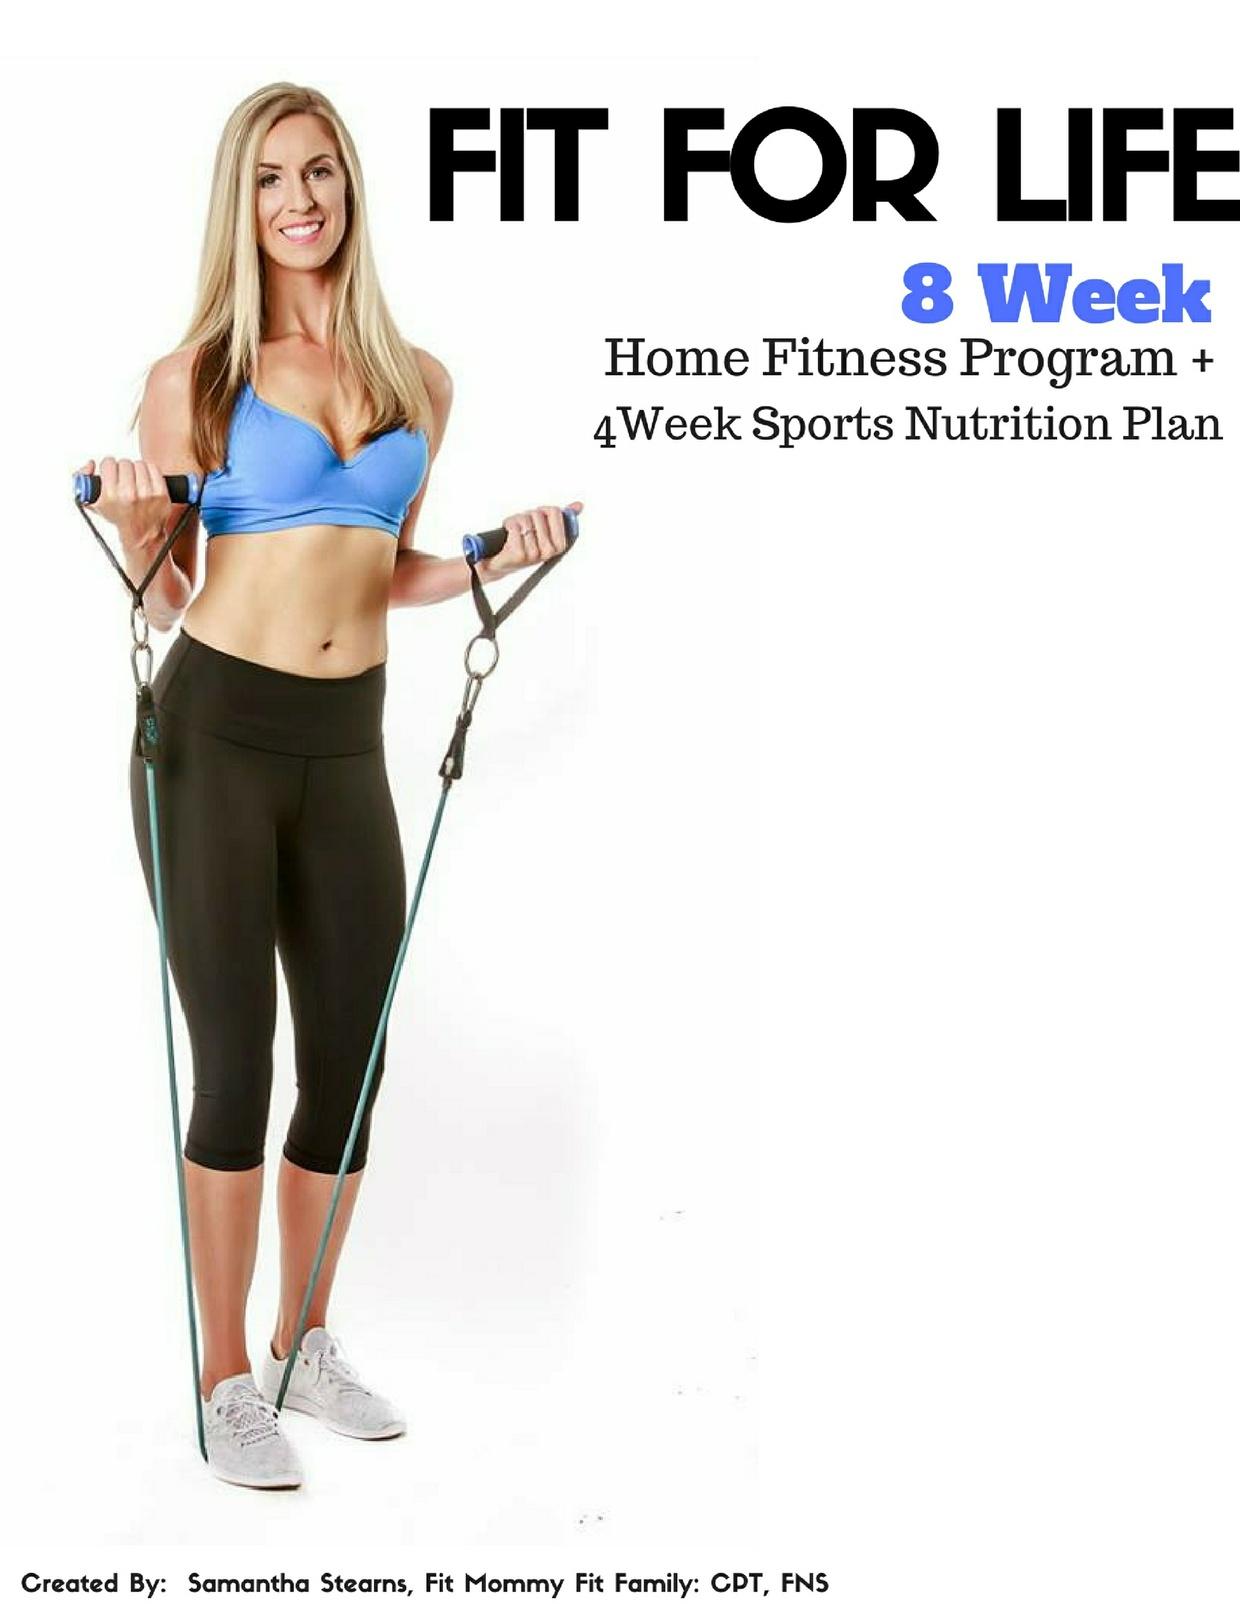 Fit for Life- 8 Week Home Fitness Program + 4 Week Sports Nutrition Program